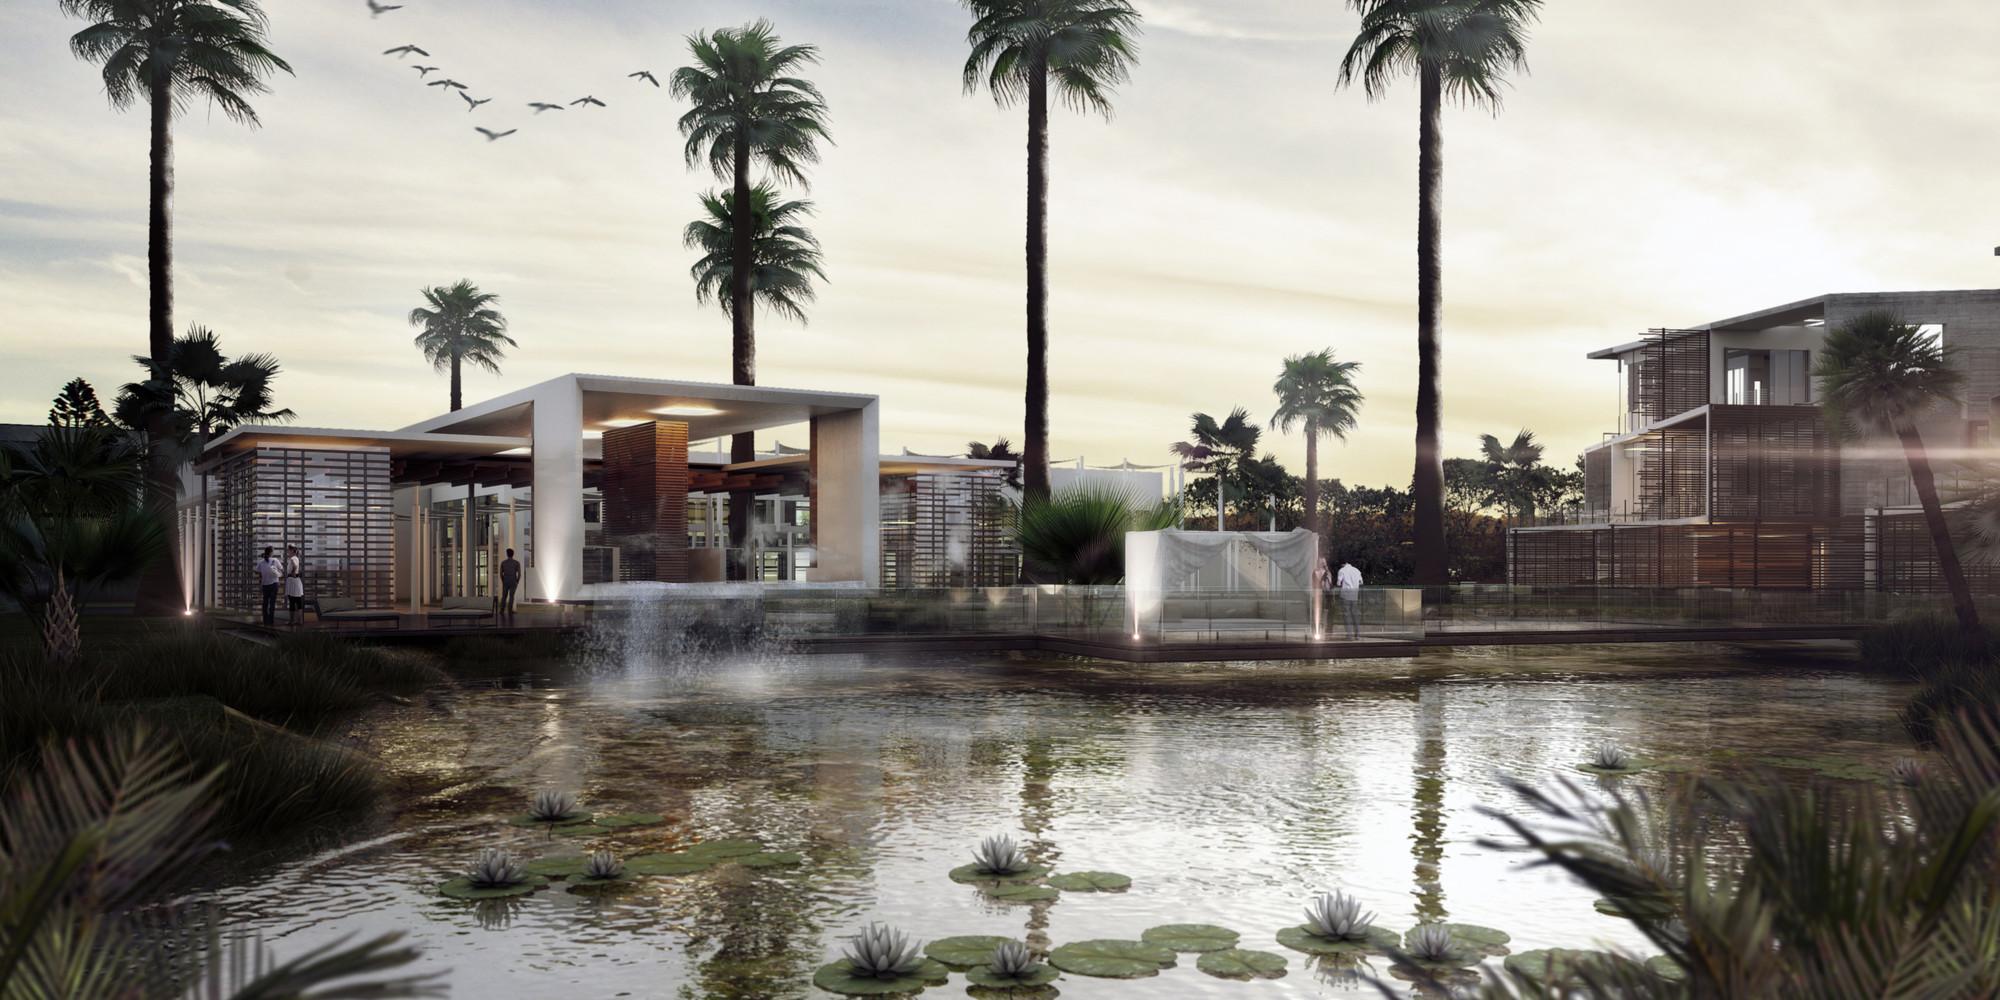 Despacho mexicano desarrolla proyecto ecológico en Cancún, México, © CG Veron